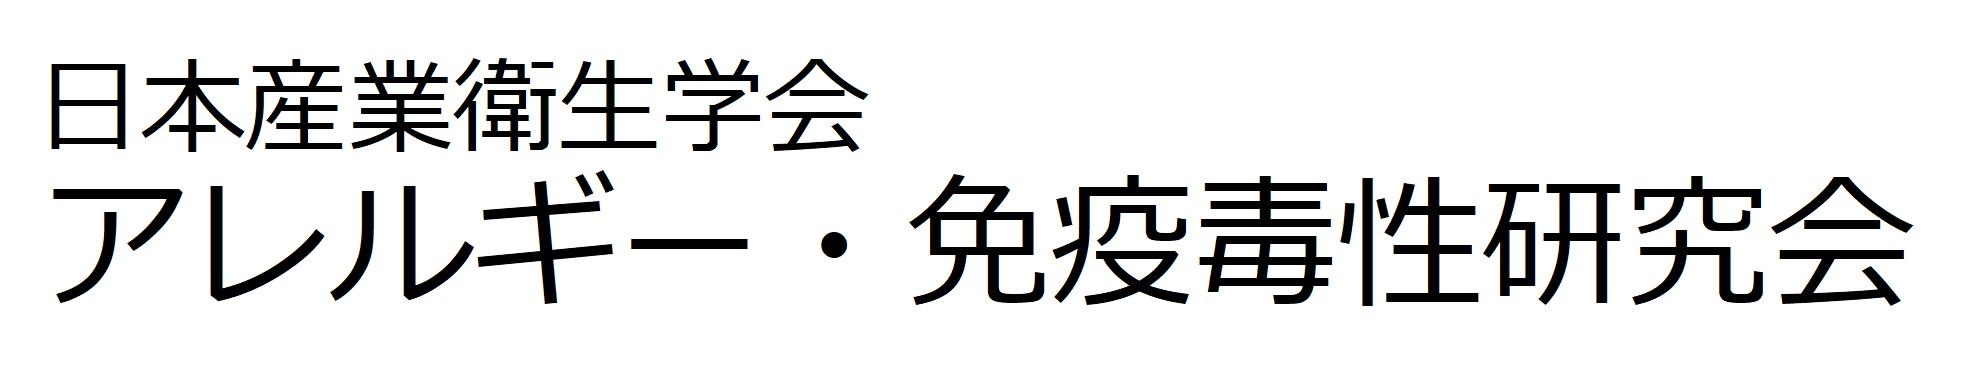 日本産業衛生学会アレルギー・免疫毒性研究会